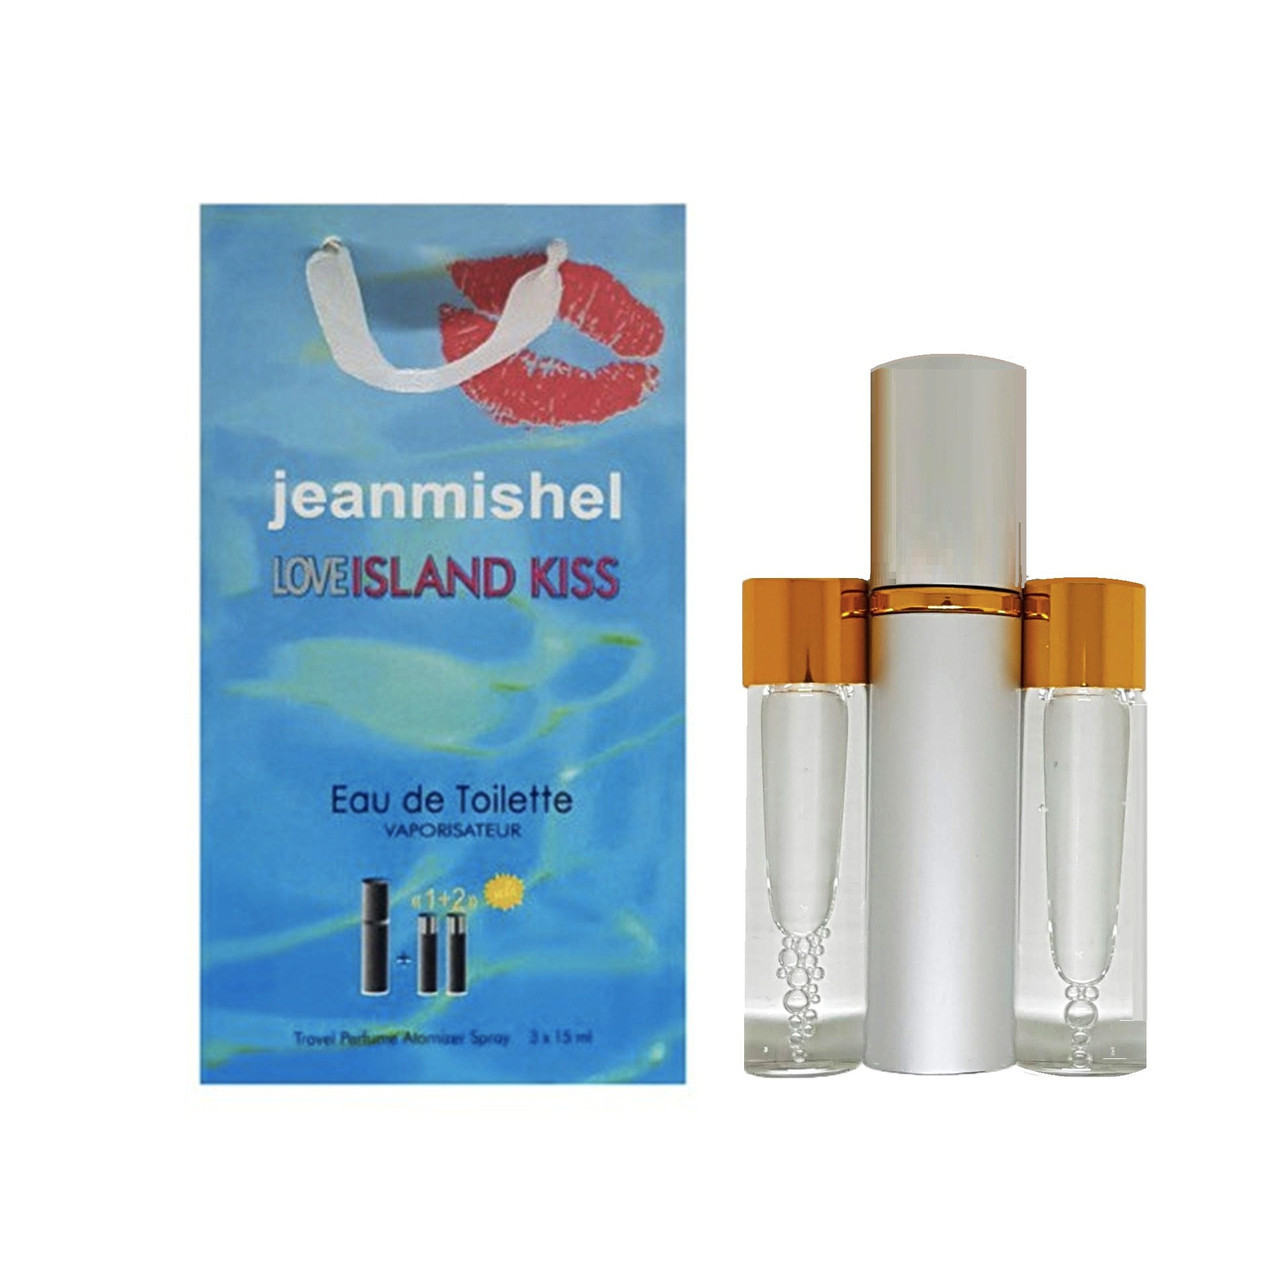 Парфюм-спрей Jeanmishel Love Island Kiss (33) 3 x 15 мл